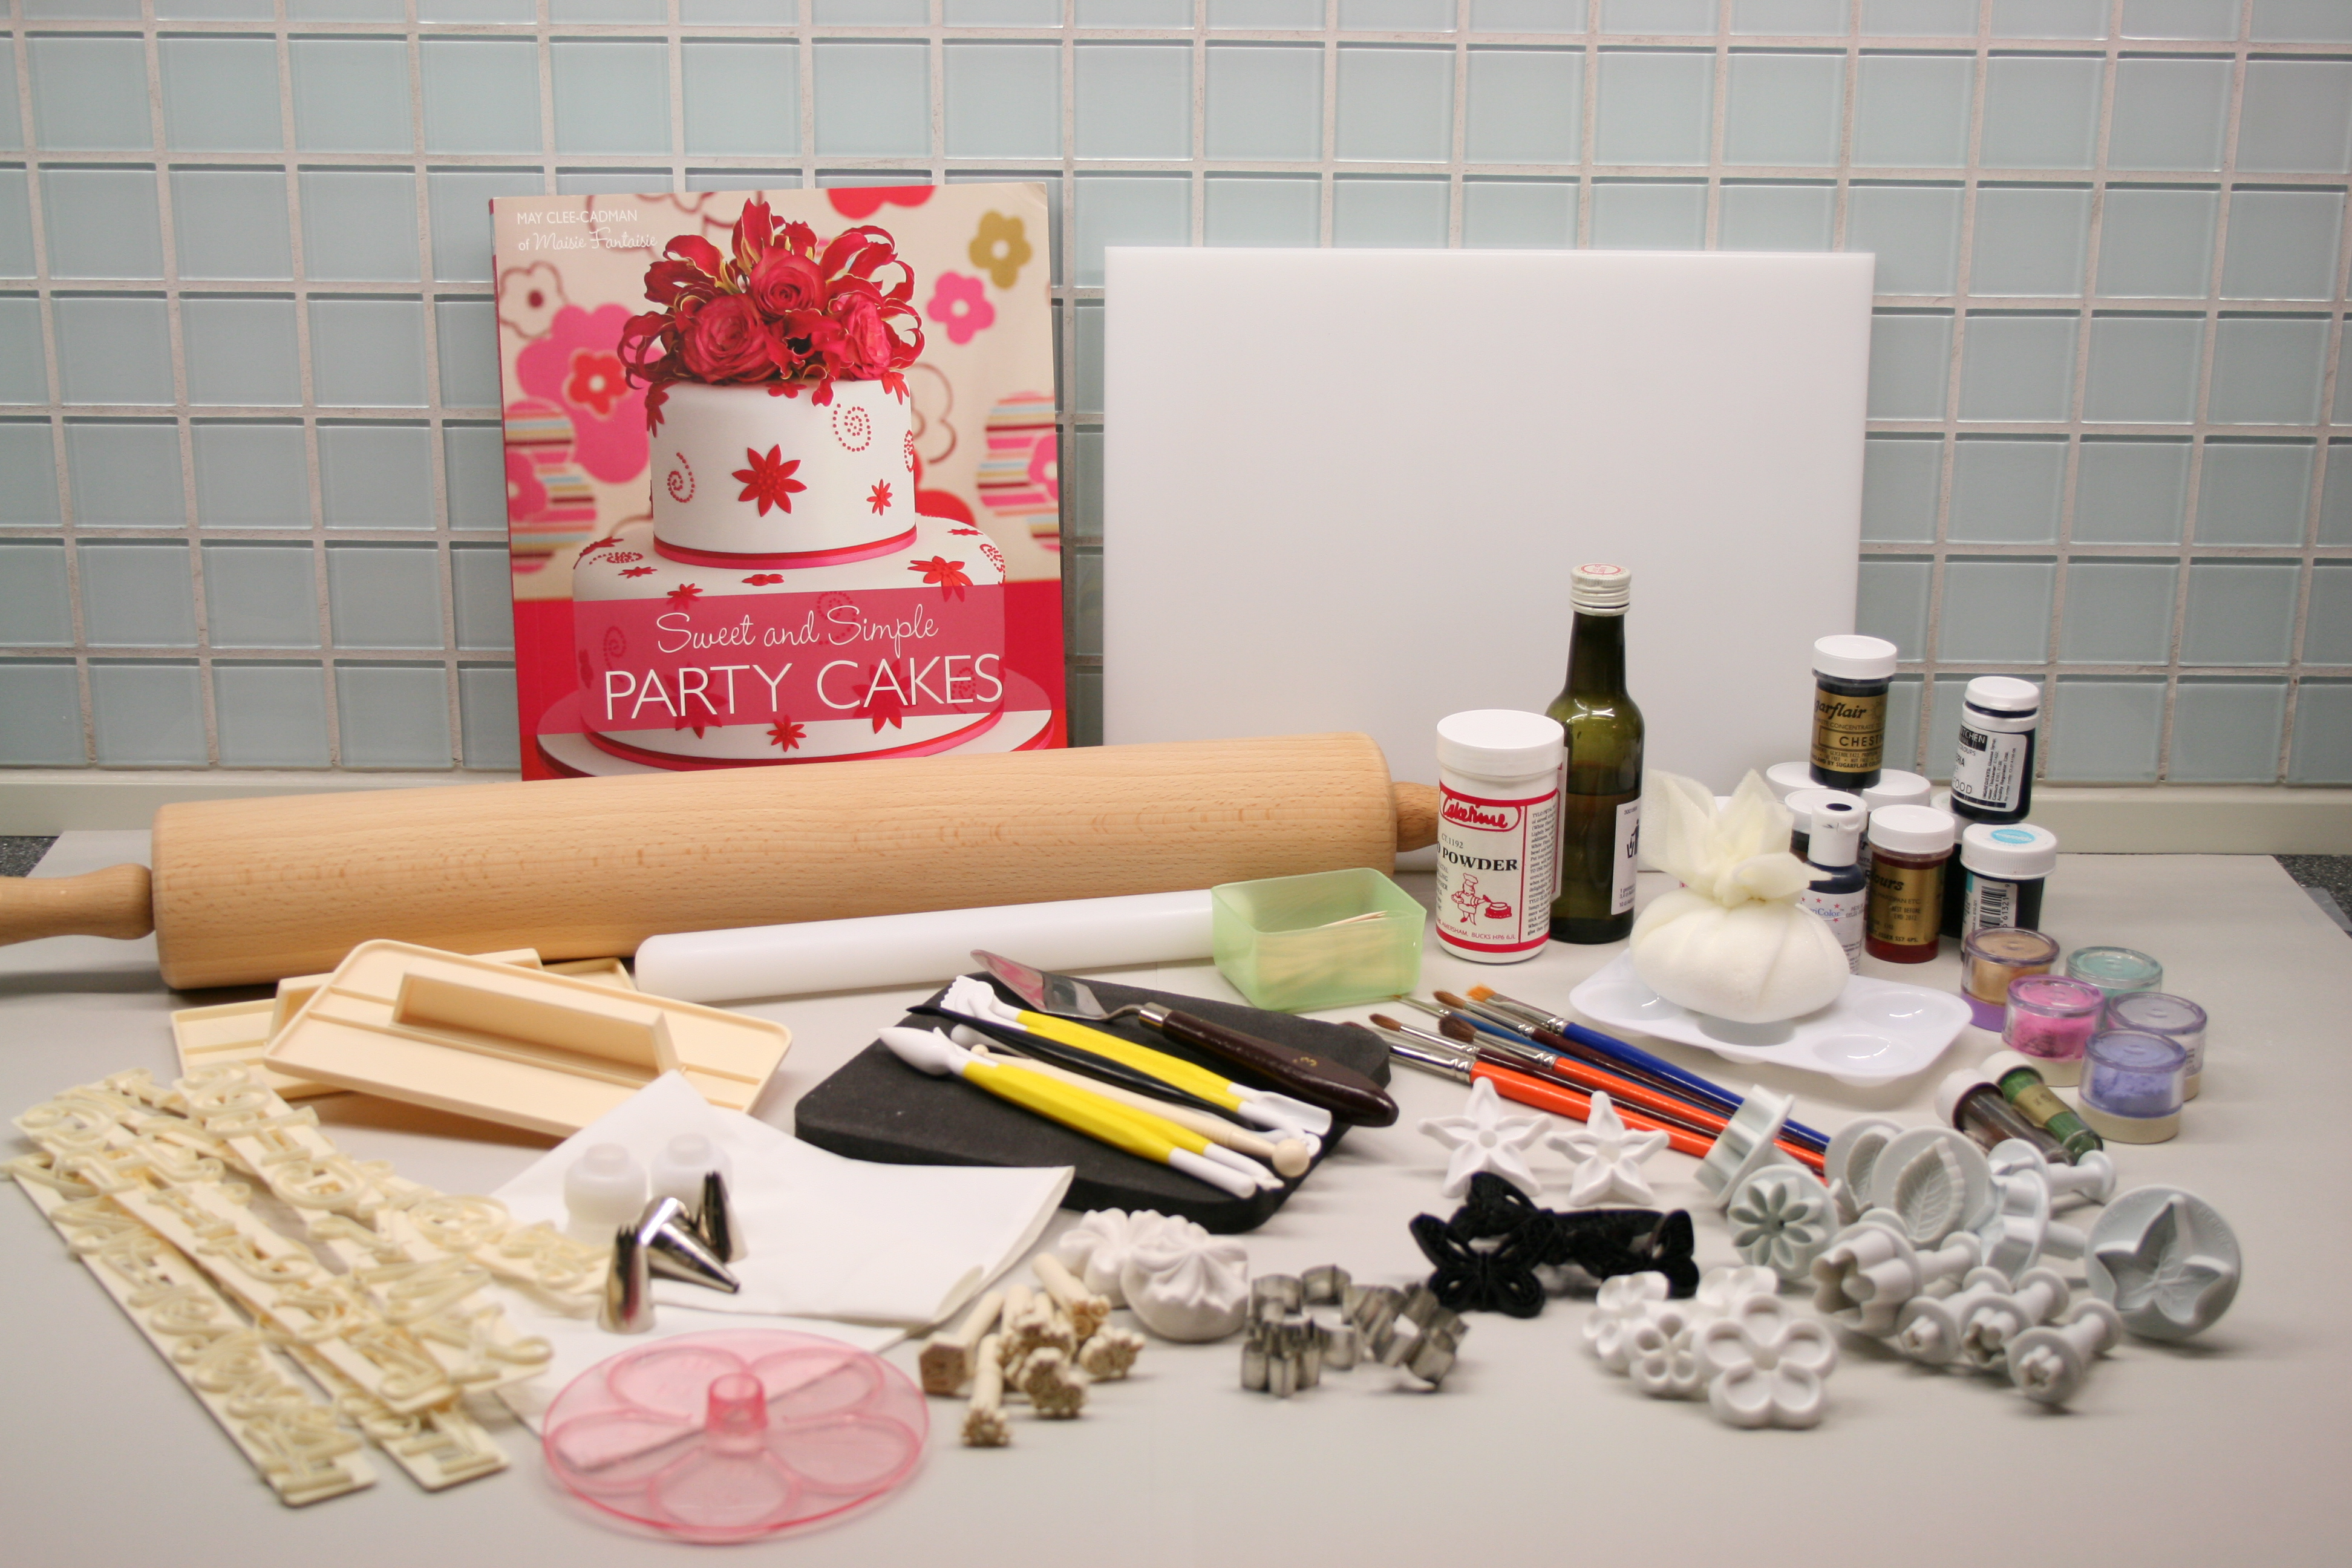 jacksonville cake decorating supplies llc - Cake Decorator